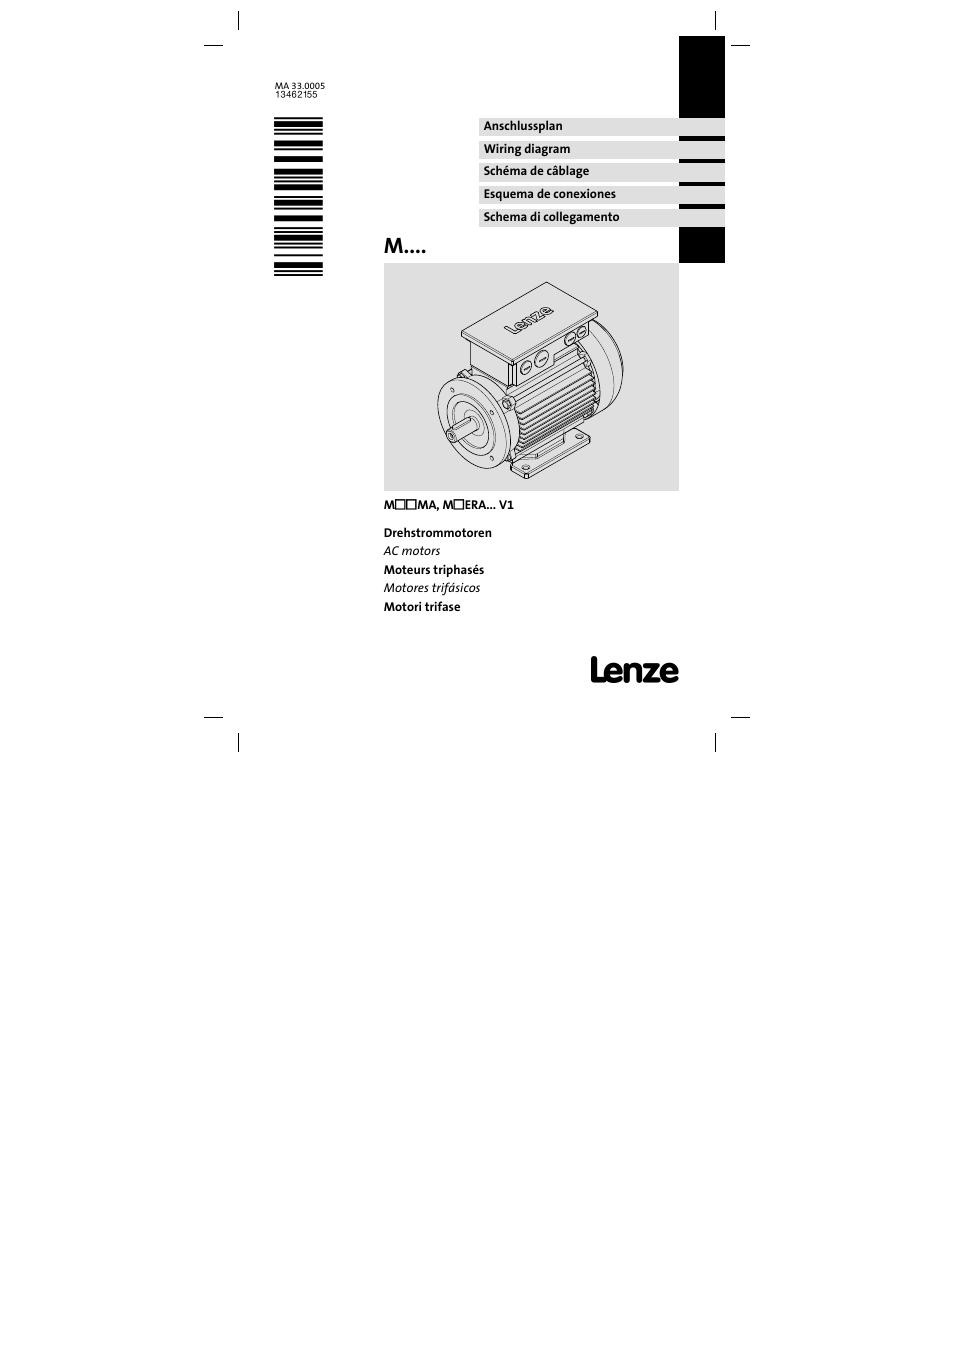 Lenze mhera three phase ac motors user manual 36 pages for Three phase ac motors